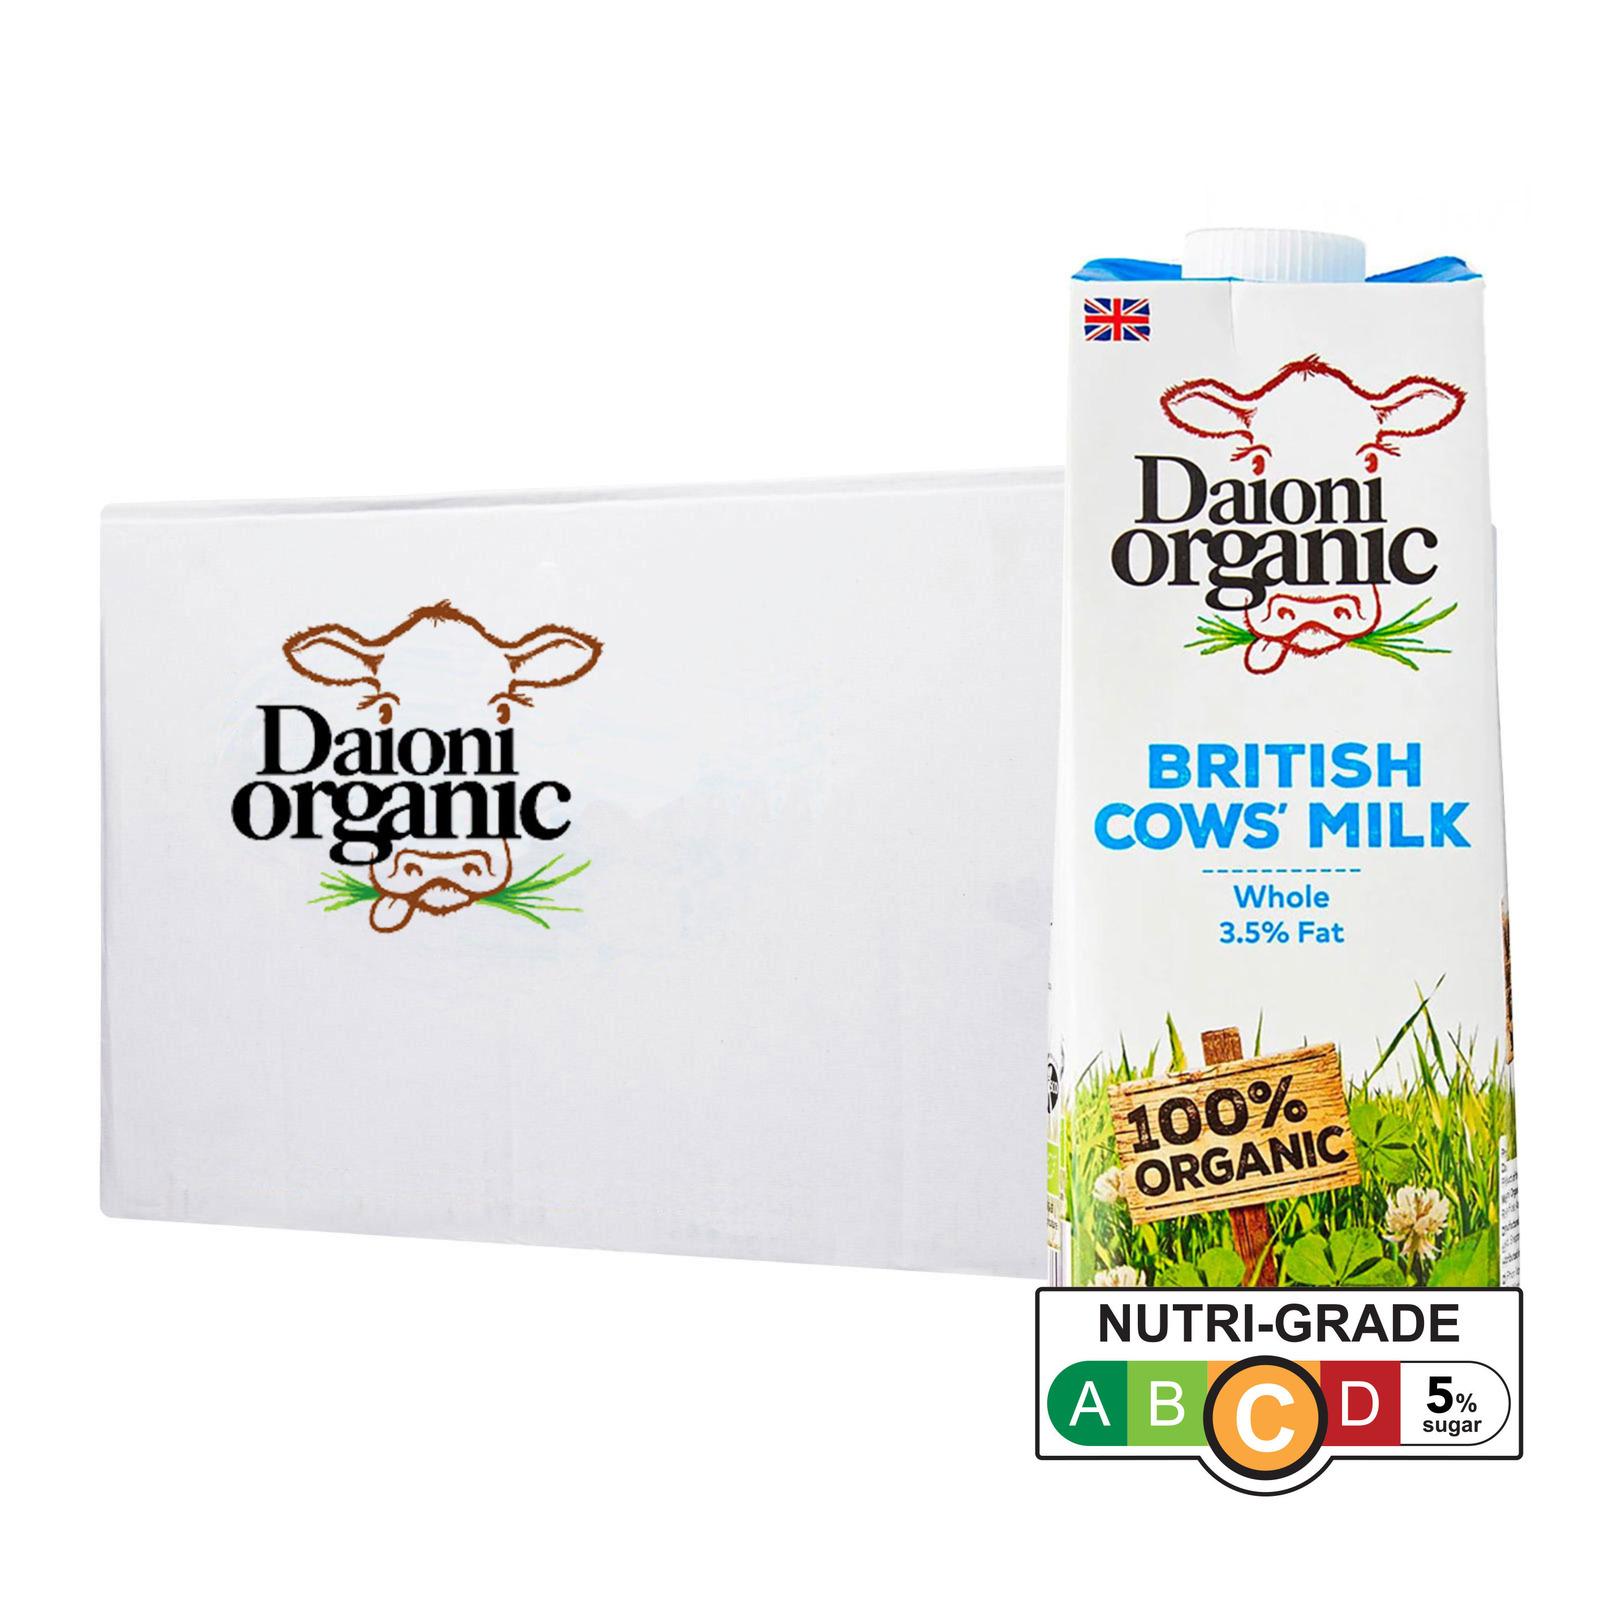 Daioni Organic Whole UHT Milk